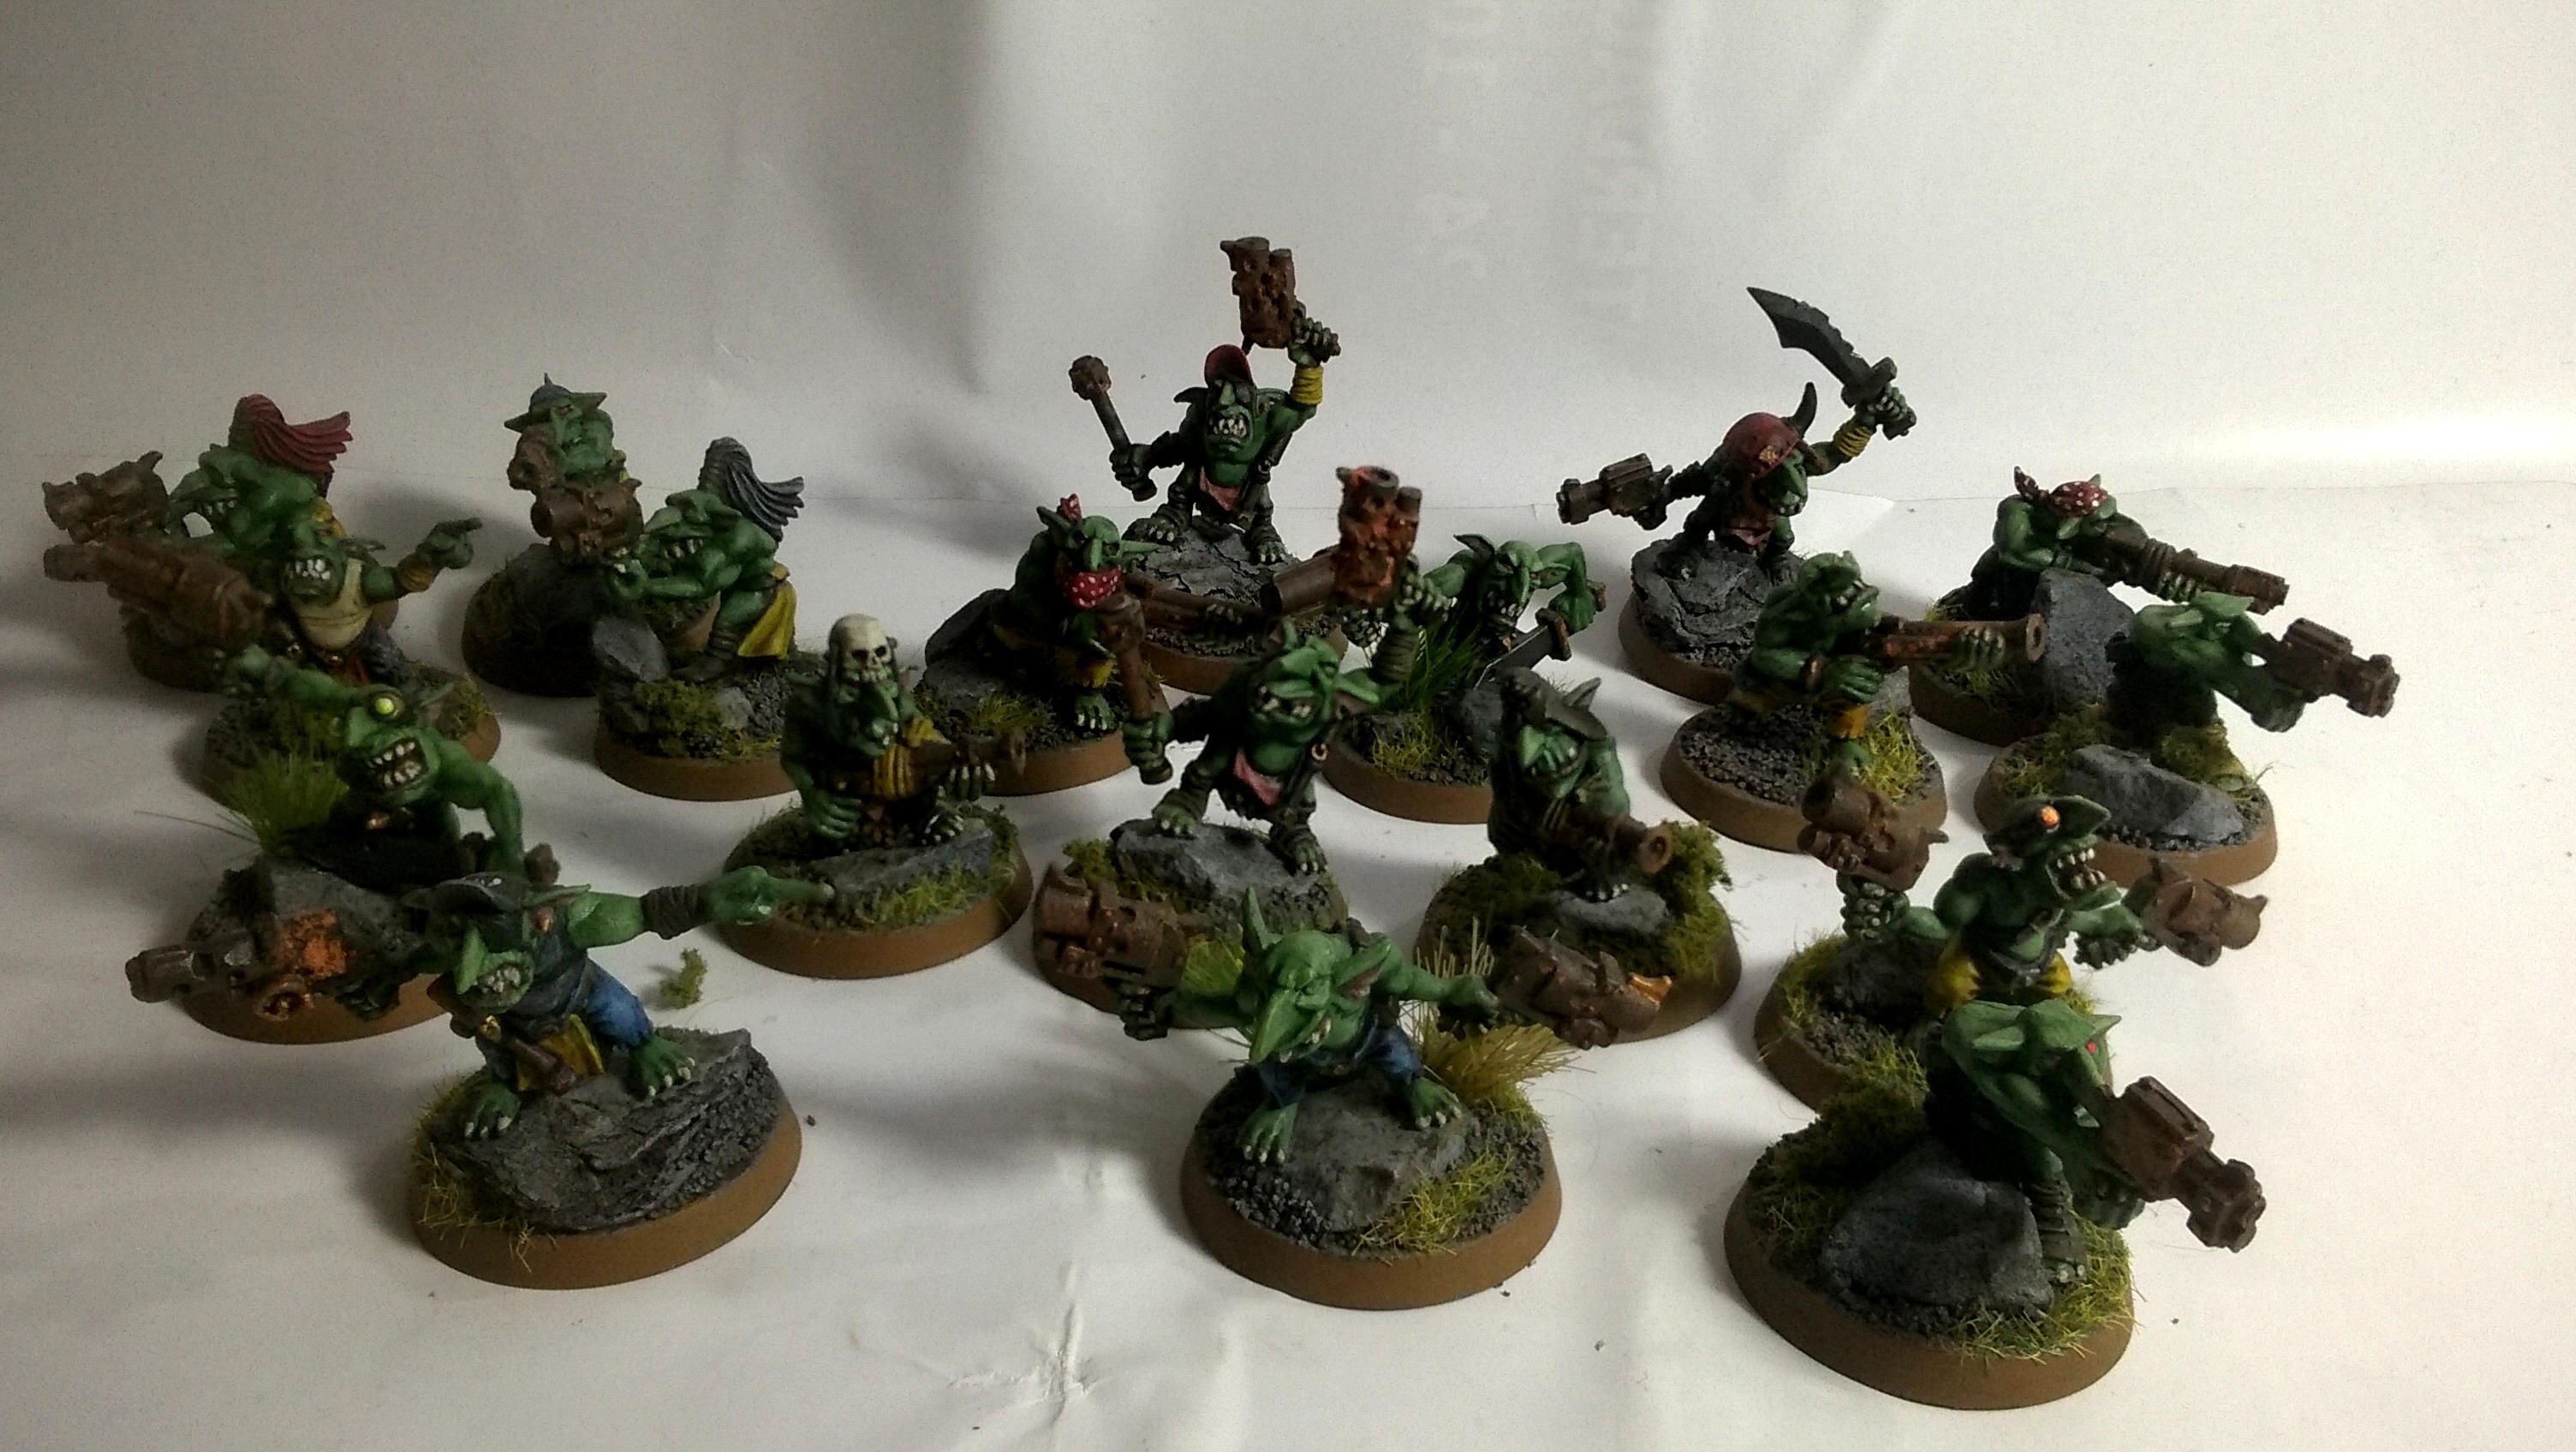 Gretchin, Merlin, Orks